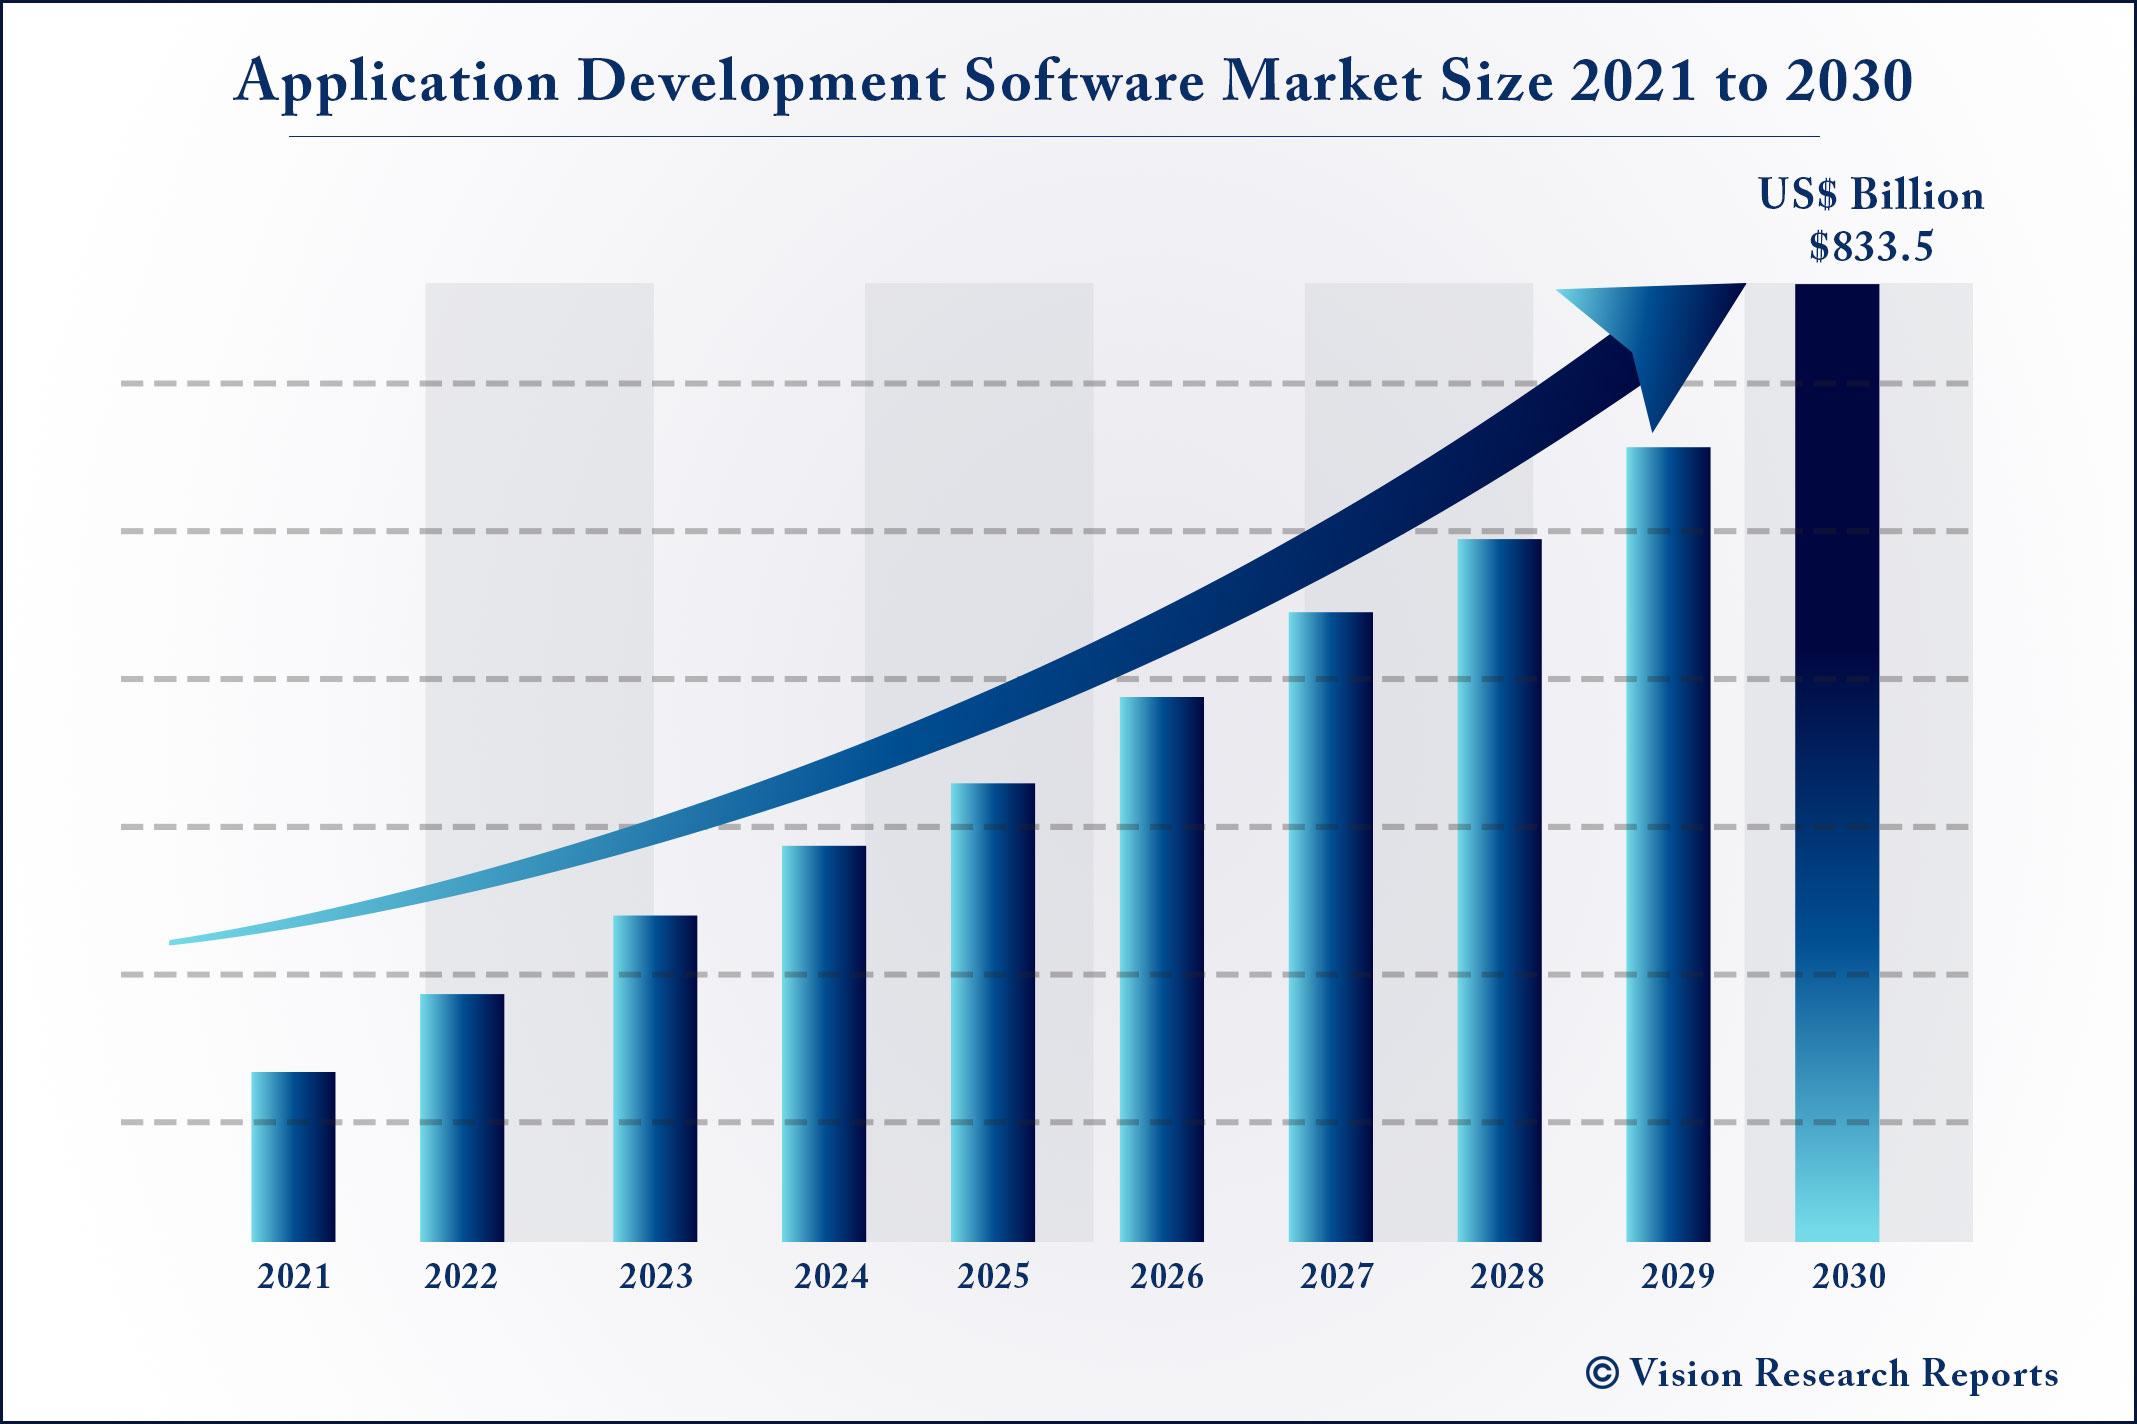 Application Development Software Market Size 2021 to 2030